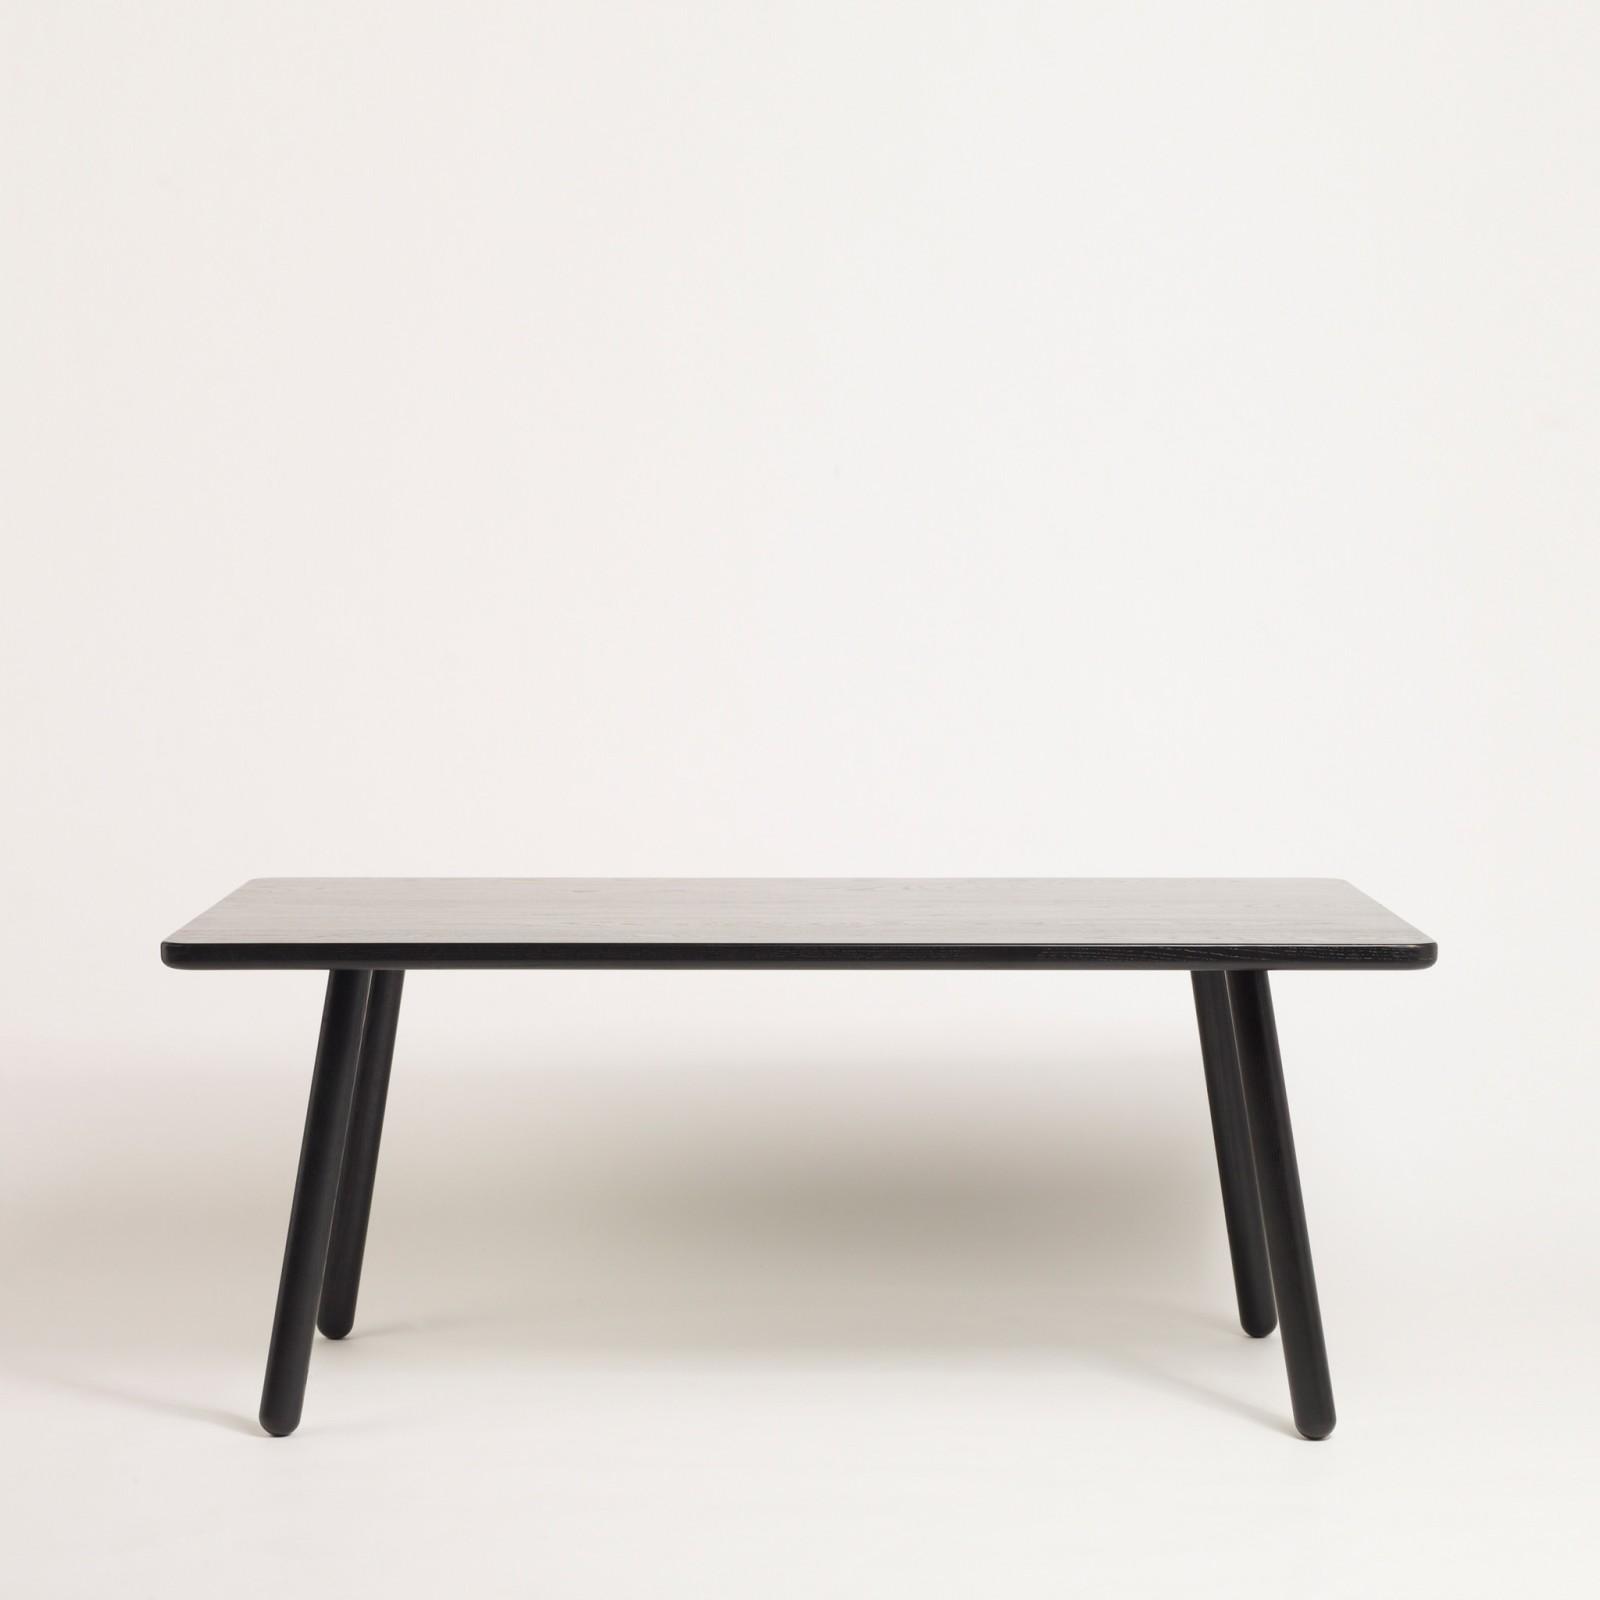 Dining Table One - Rectangular Black, 180 cm Long